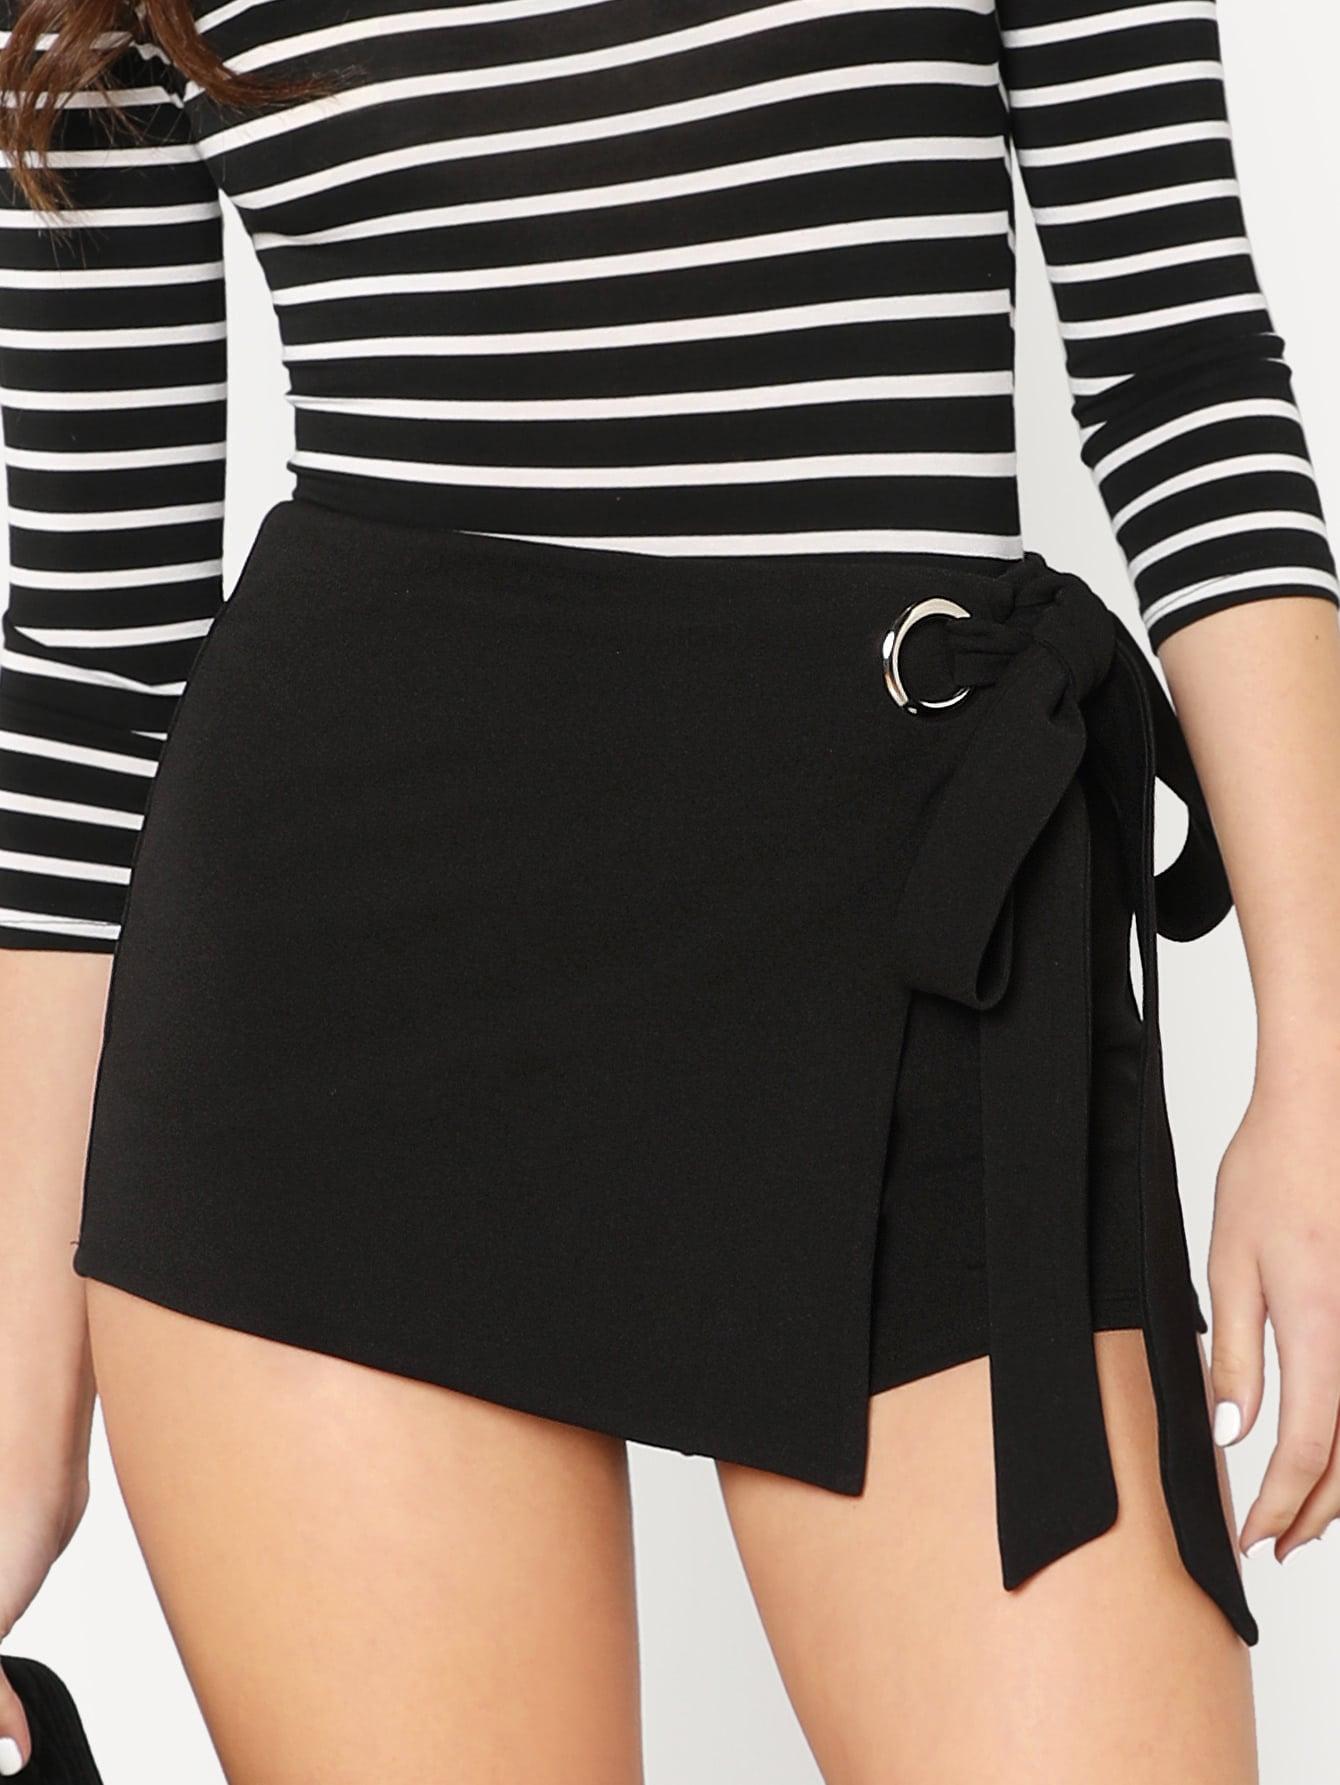 цены Self Belted Overlap Shorts